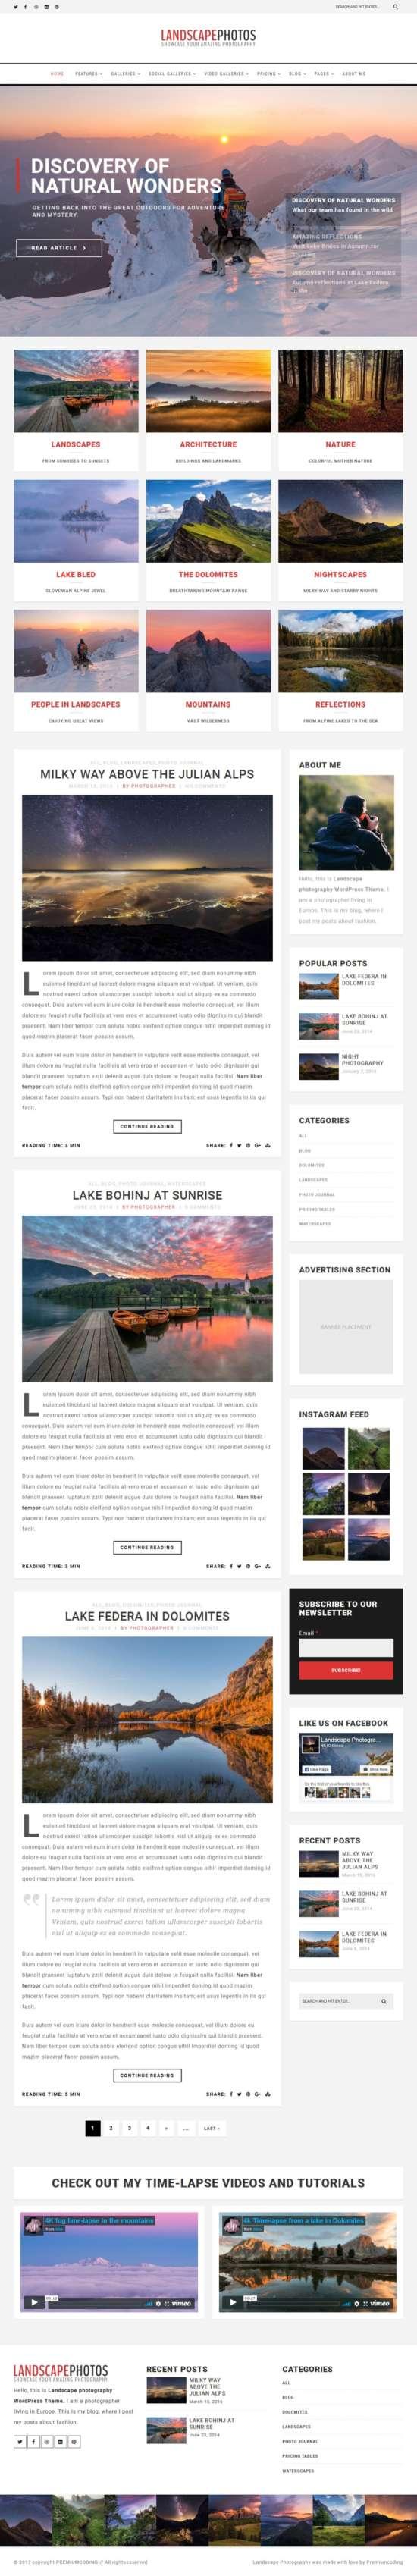 landscape photo blog templatemonster 01 550x3397 - Landscape Photography WordPress Theme